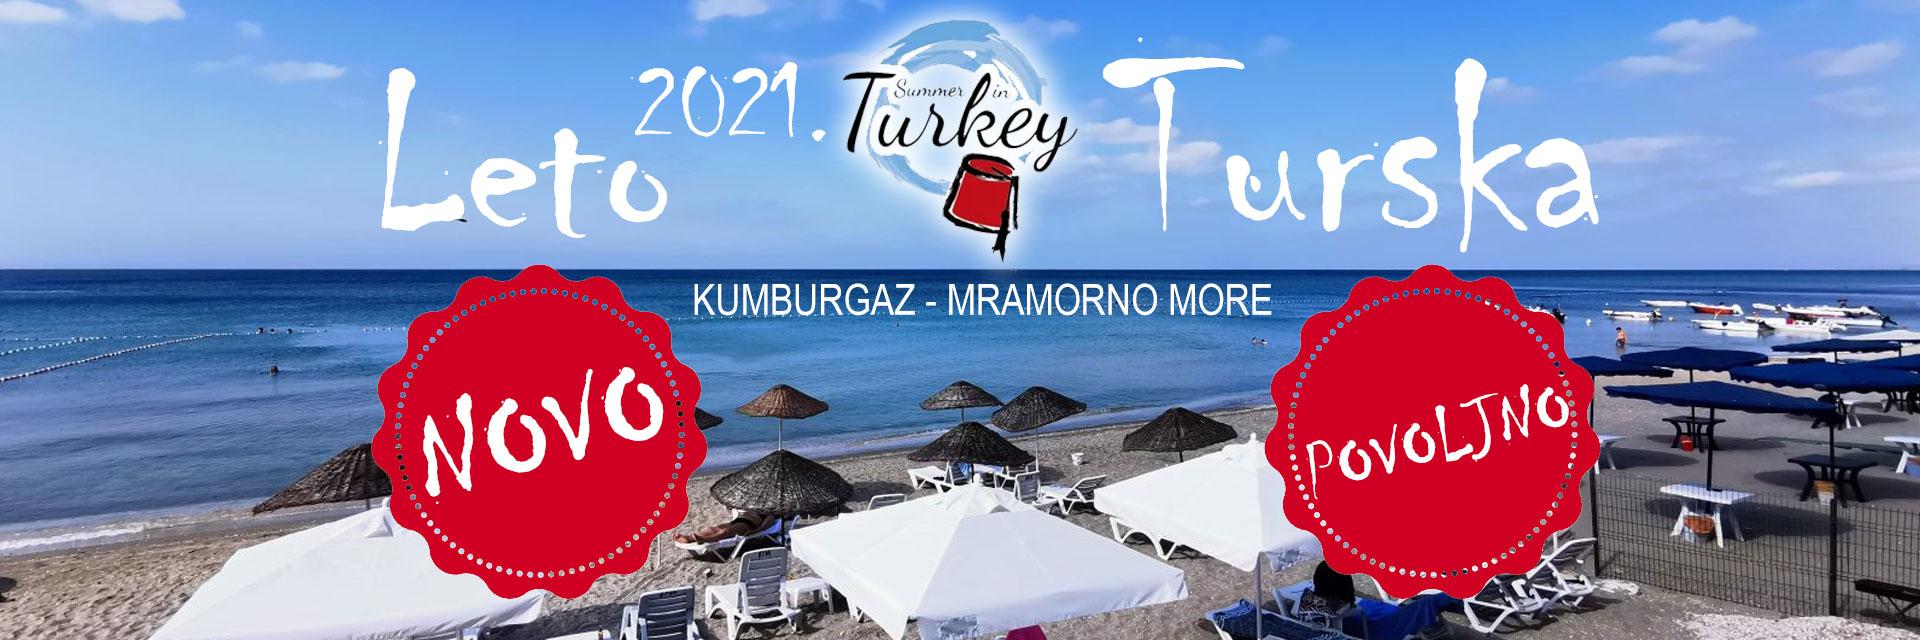 kumbargaz-turska-slajder-2021